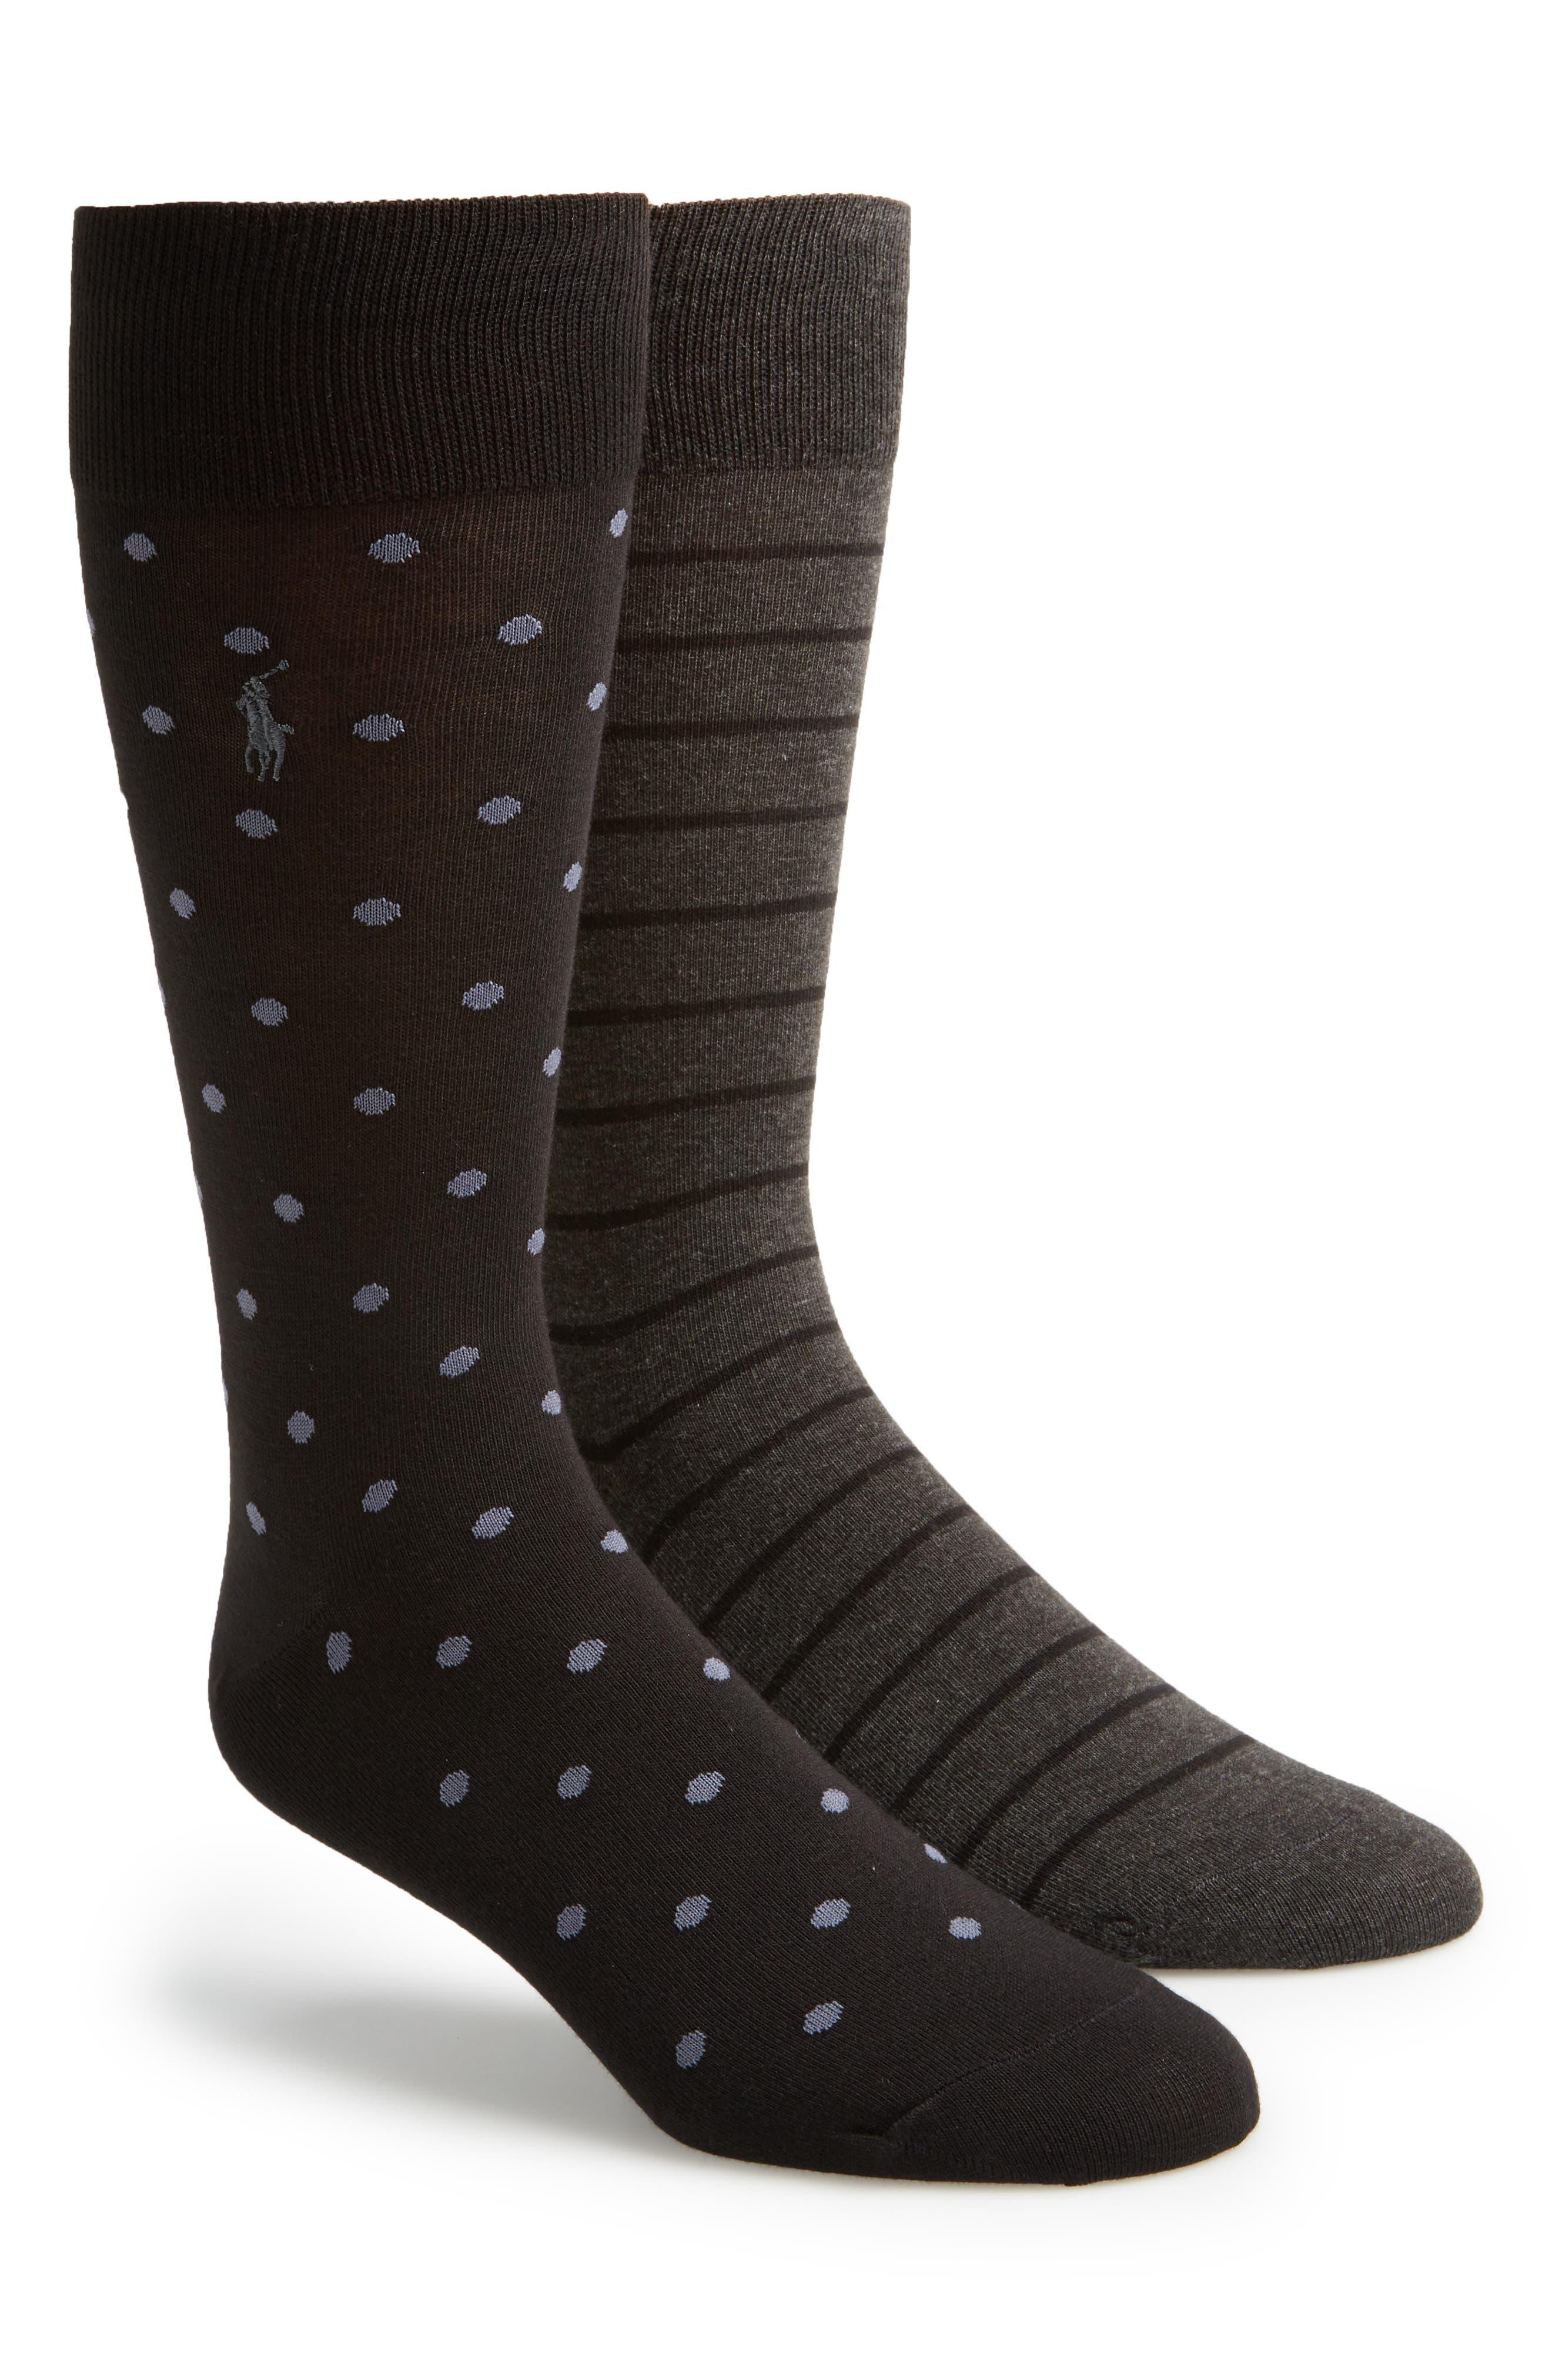 2-Pack Socks,                         Main,                         color, Charcoal